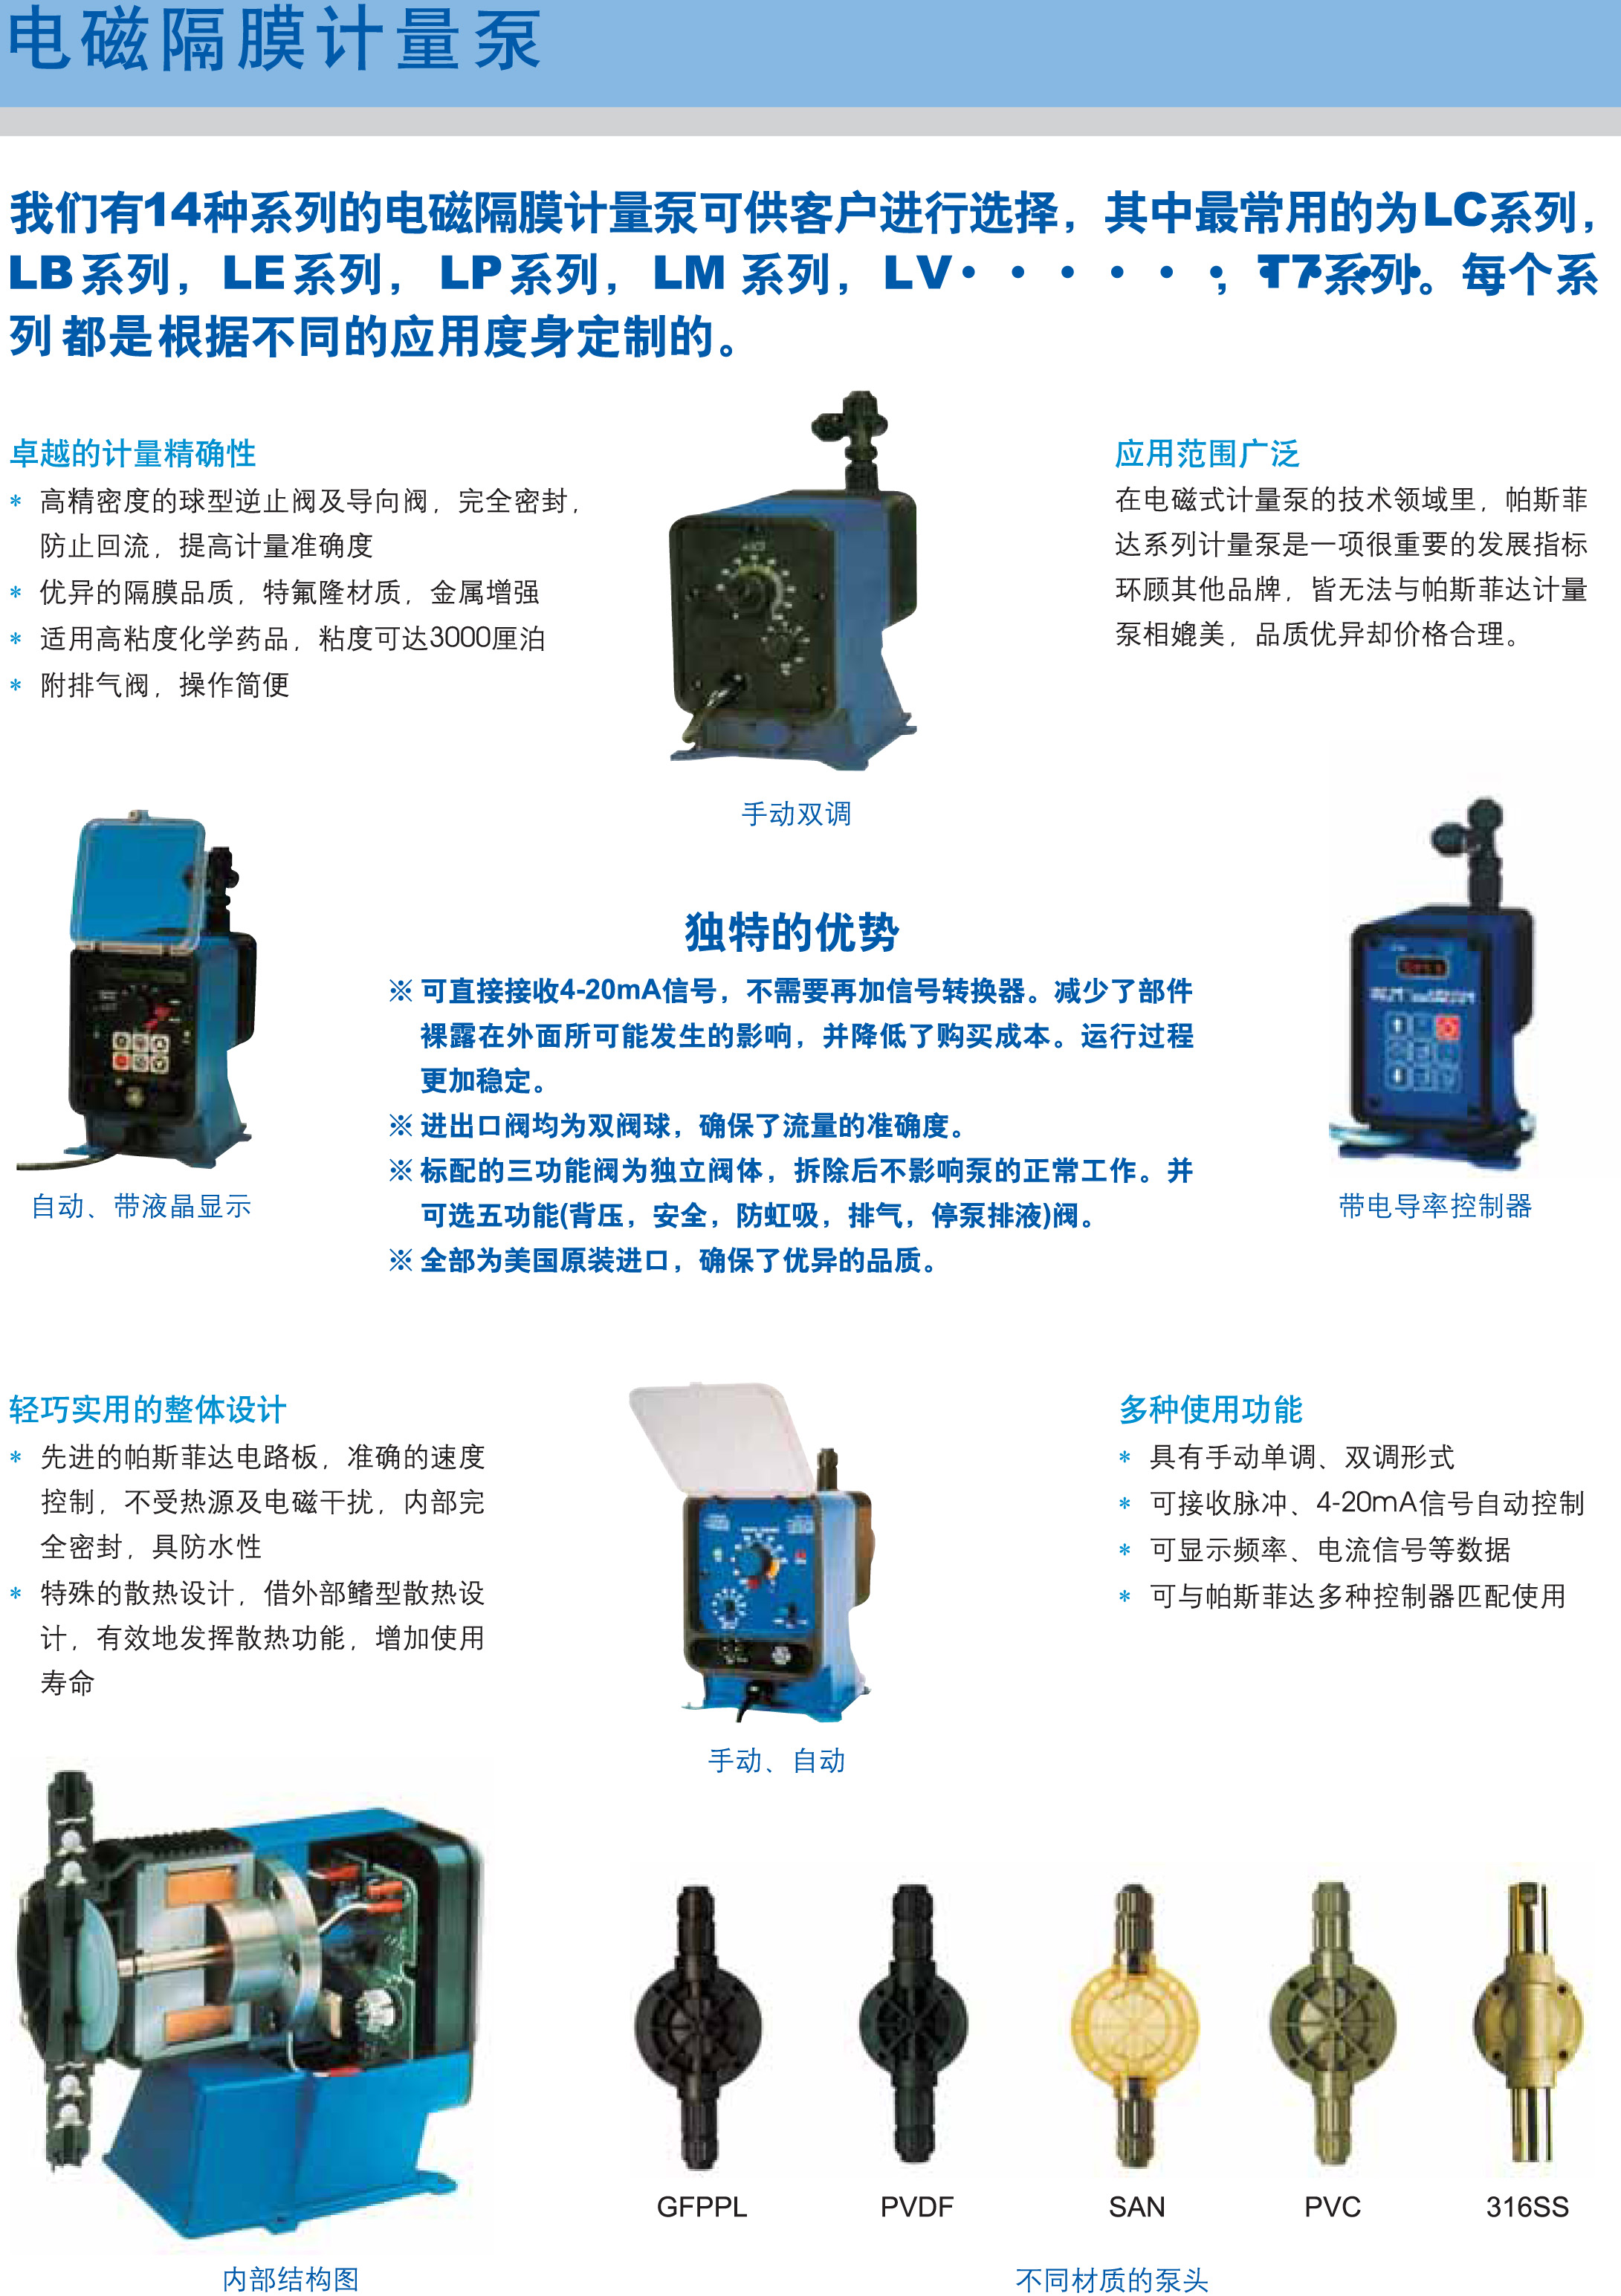 lv系列电磁隔膜计量泵